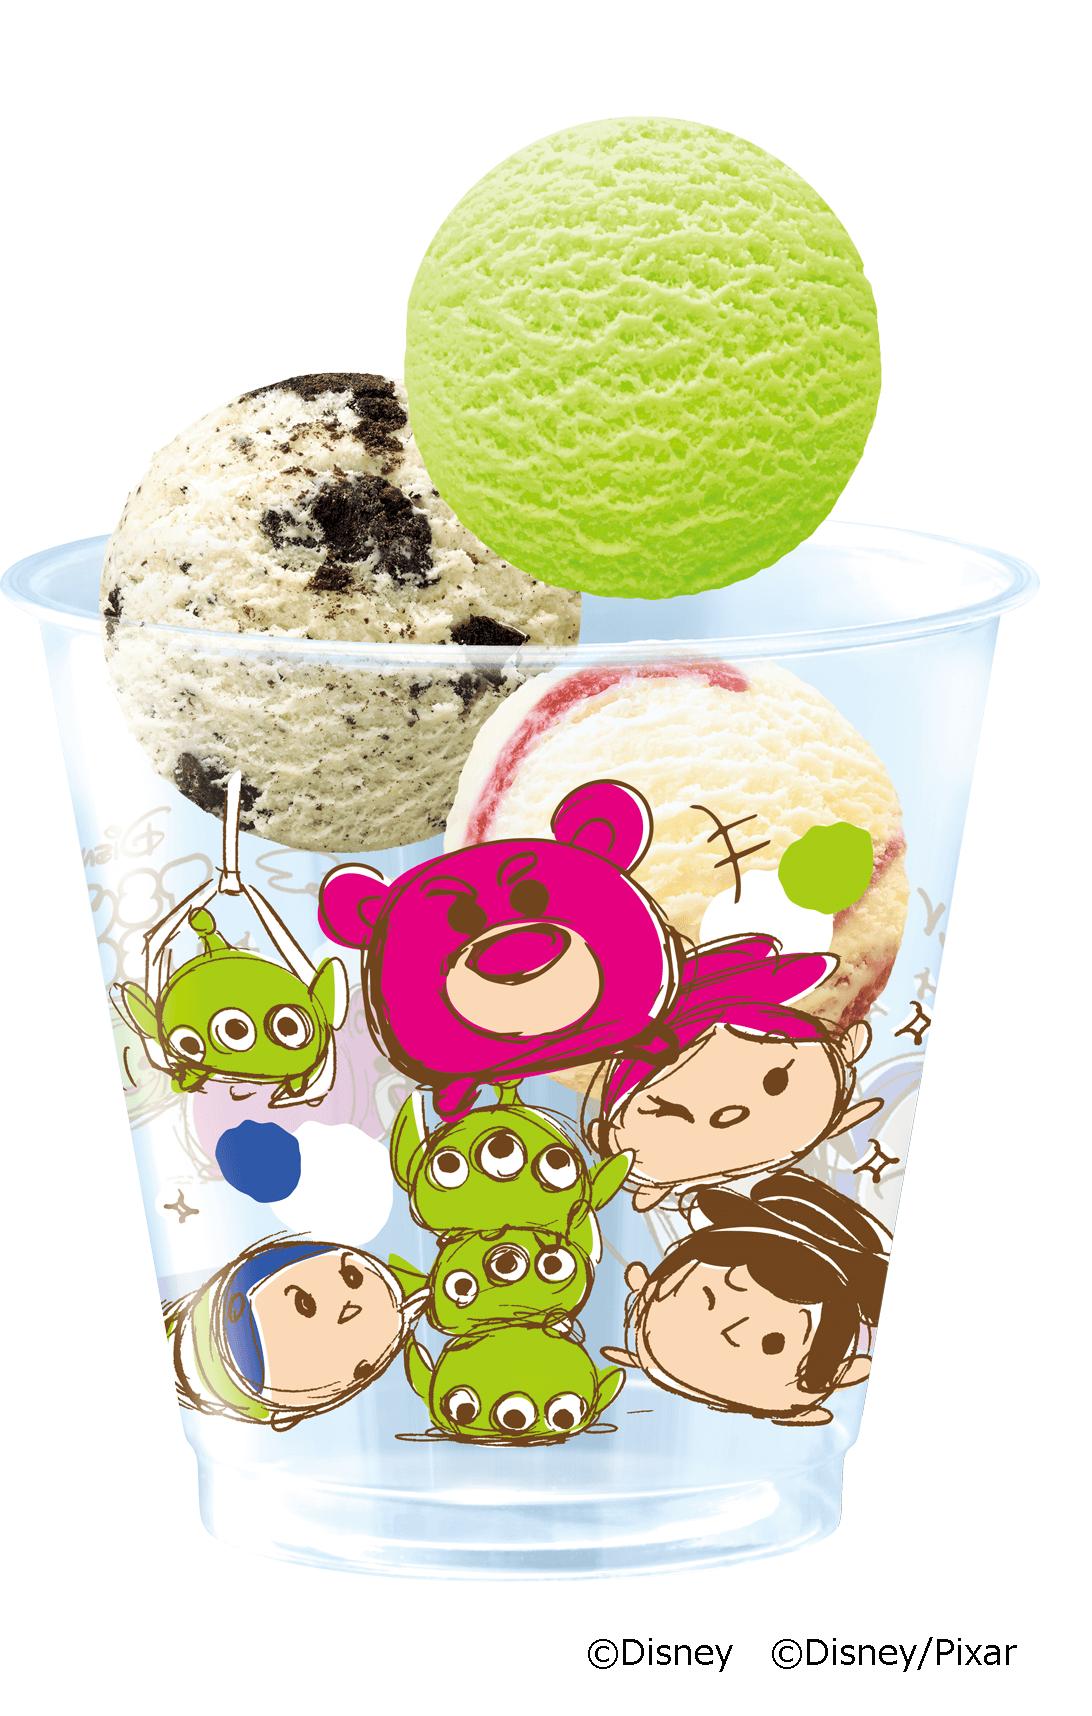 b%e2%80%90r-%e3%82%b5%e3%83%bc%e3%83%86%e3%82%a3%e3%83%af%e3%83%b3-%e3%82%a2%e3%82%a4%e3%82%b9%e3%82%af%e3%83%aa%e3%83%bc%e3%83%a0-br-31-ice-cream-%e3%80%8ctsum-tsum-%e3%83%88-3